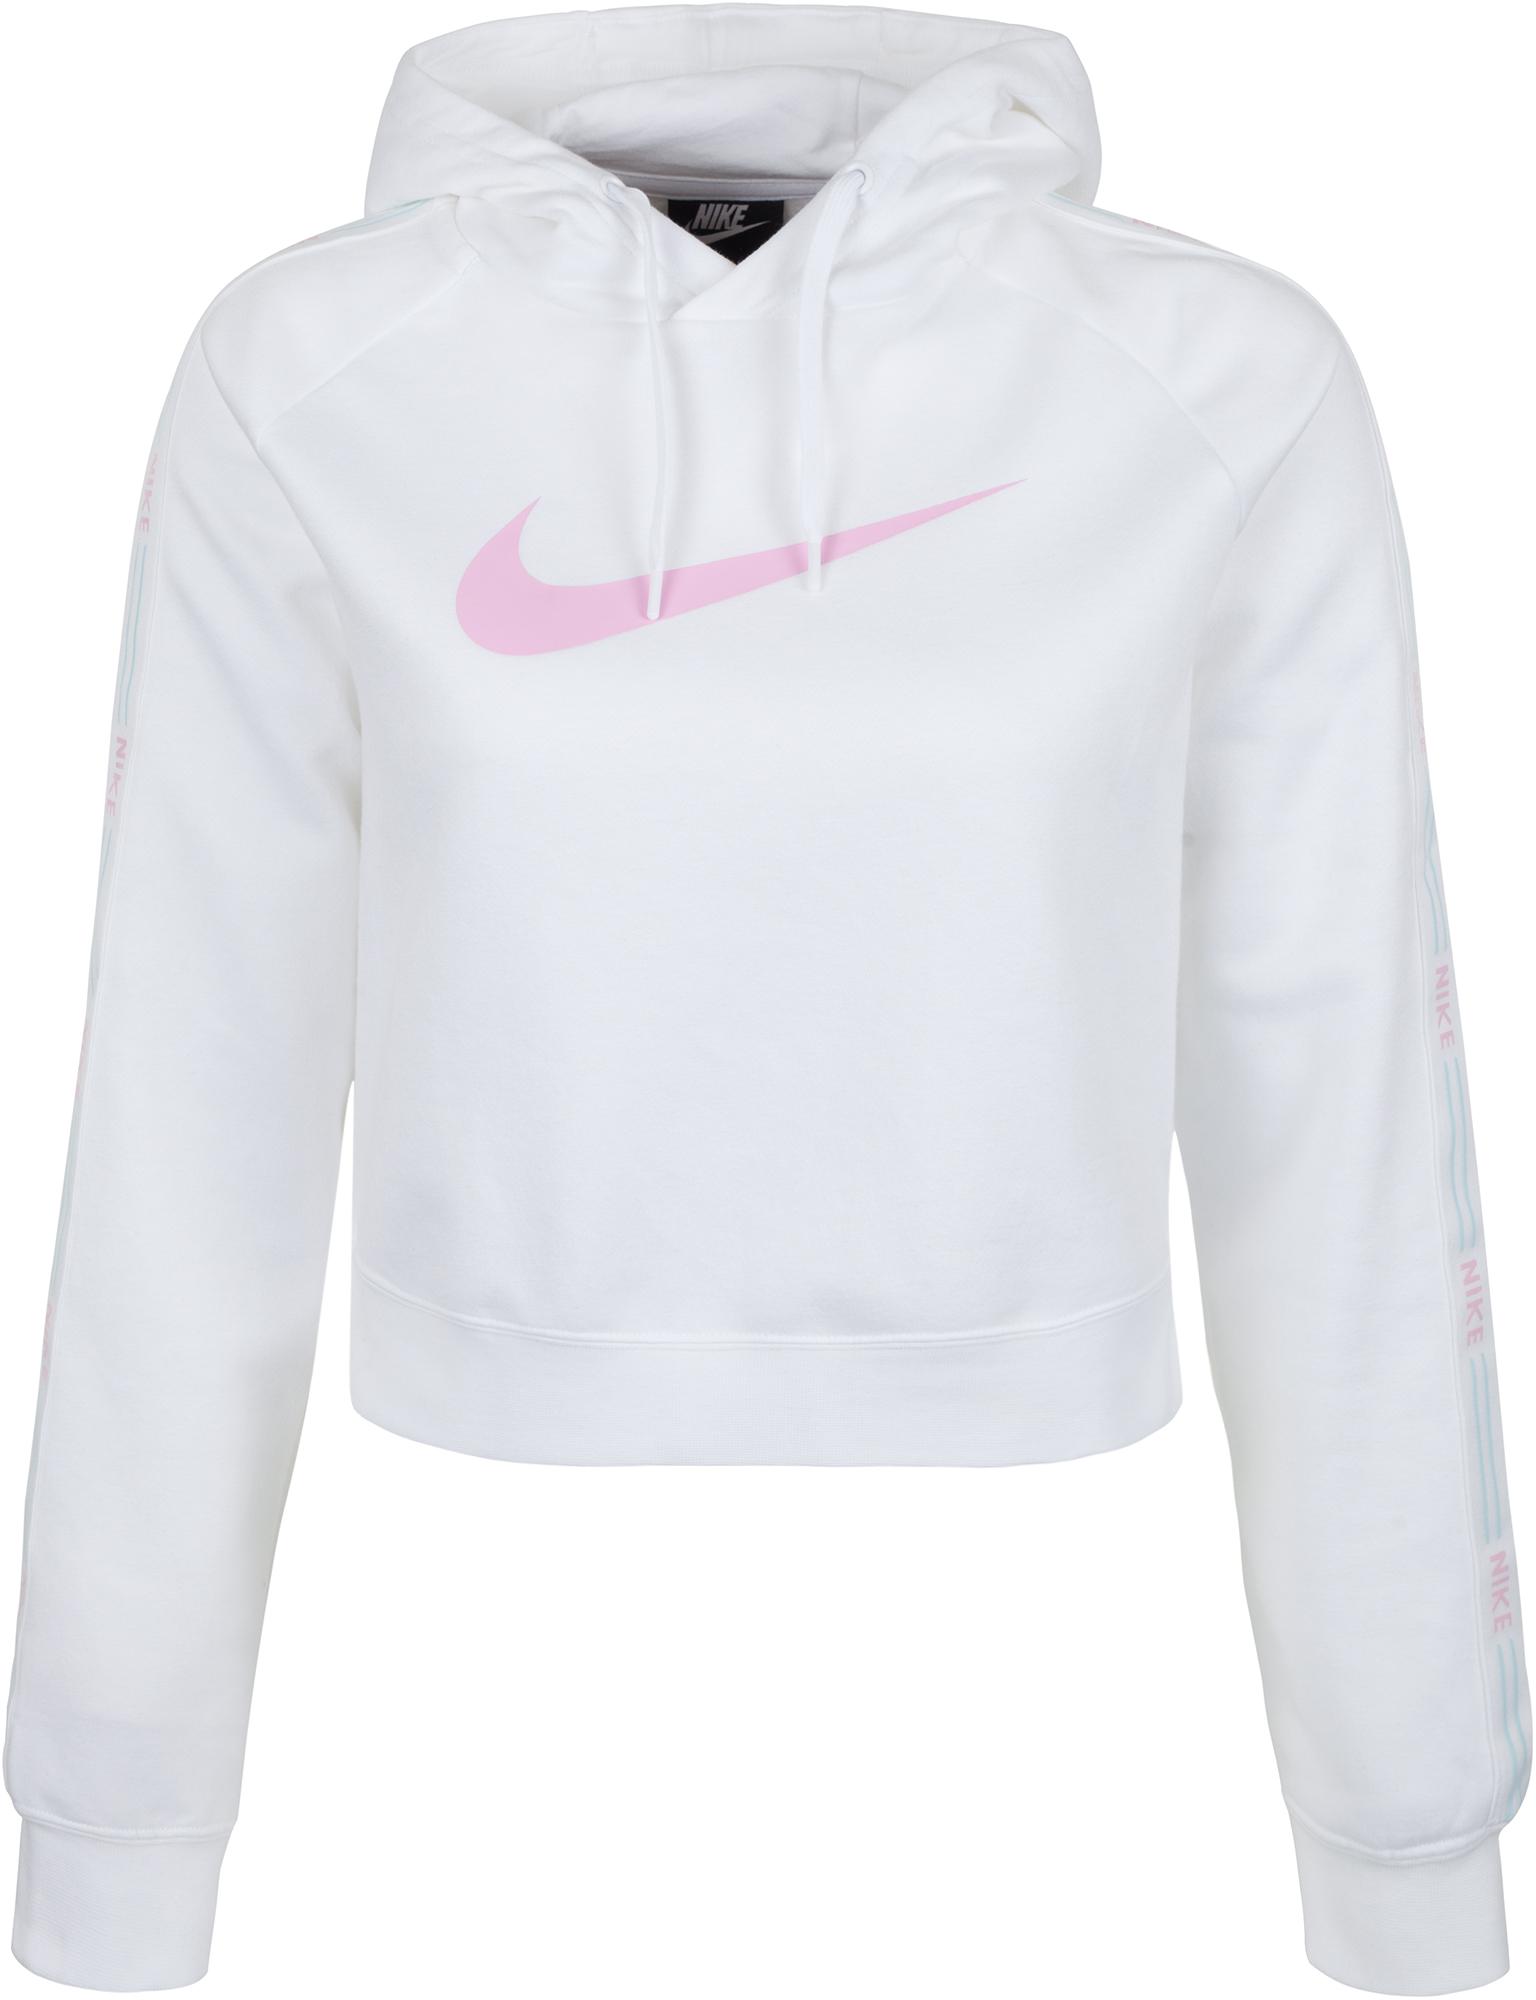 цены Nike Джемпер женский Nike Sportswear, размер 46-48